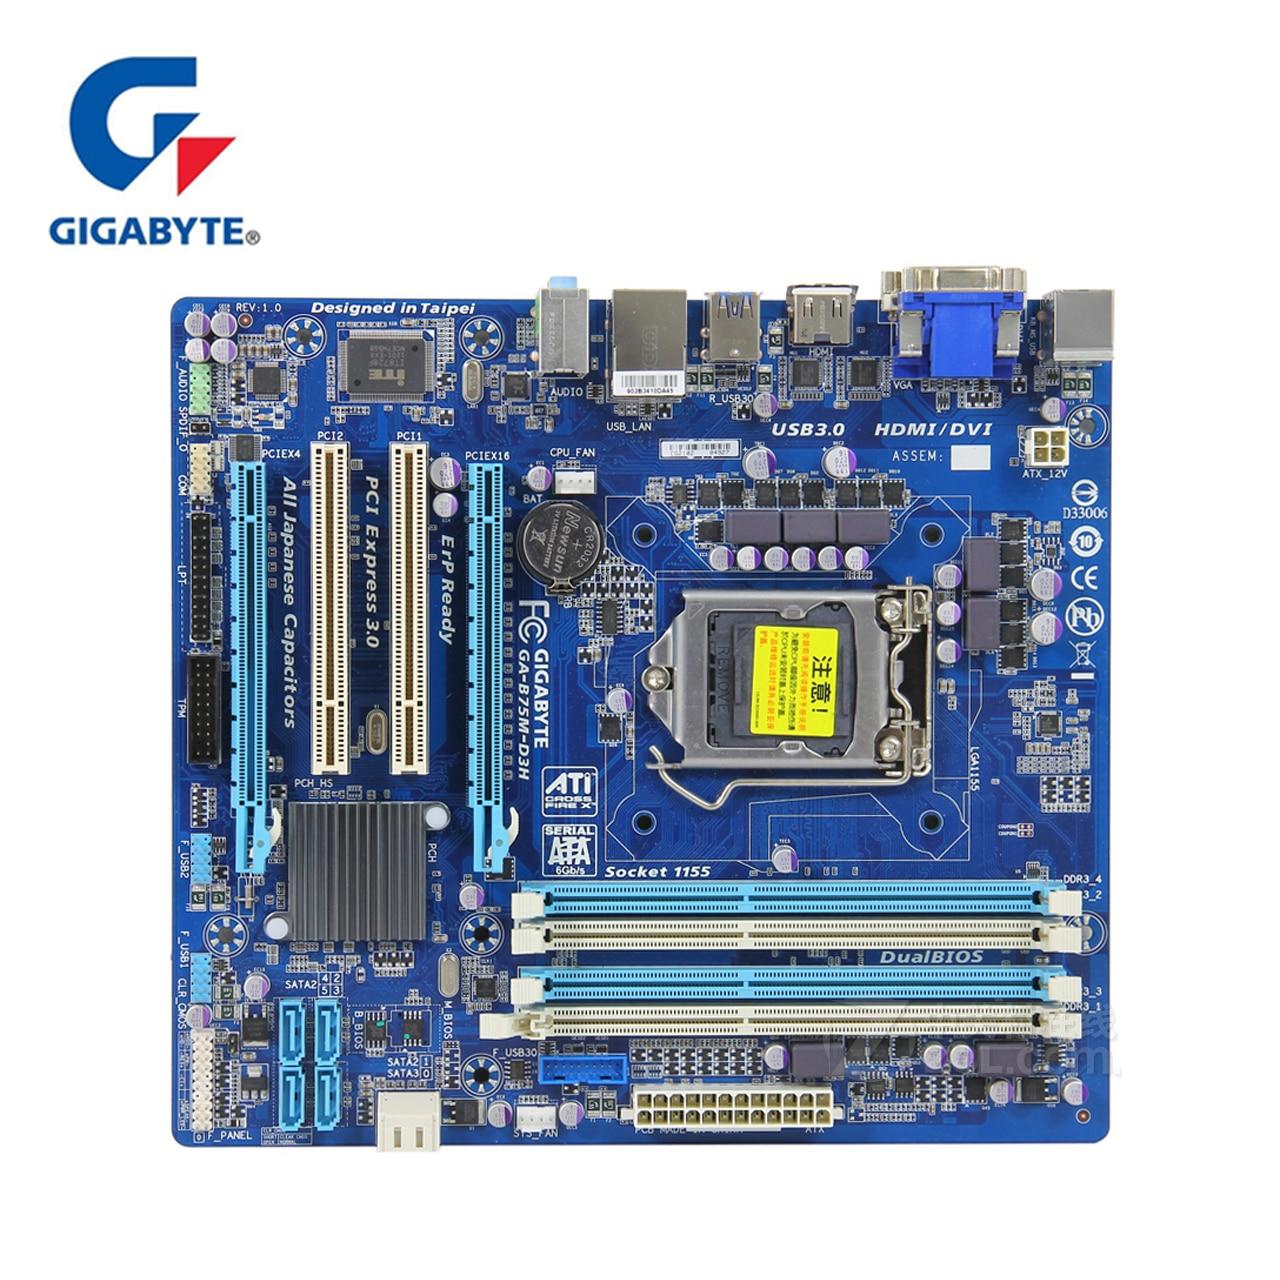 Carte mère d'origine Gigabyte GA-B75M-D3H LGA 1155 DDR3 RAM 32G B75 B75M D3H carte mère de bureau B75M-D3H DVI VGA HDMI USB3 utilisé